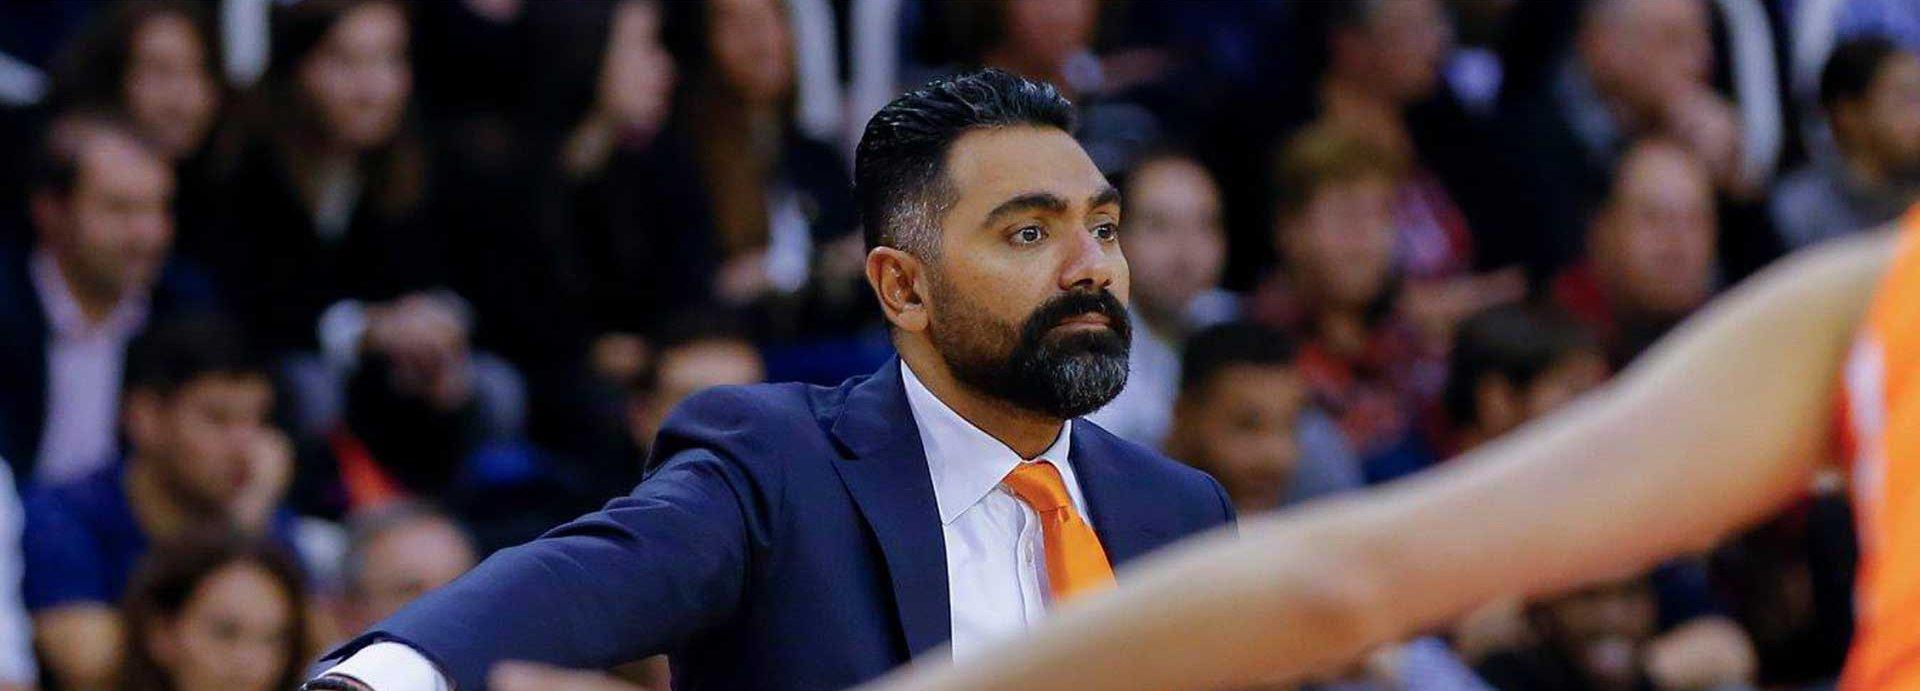 2019_OrangeLions_Hakim-Salem.jpg